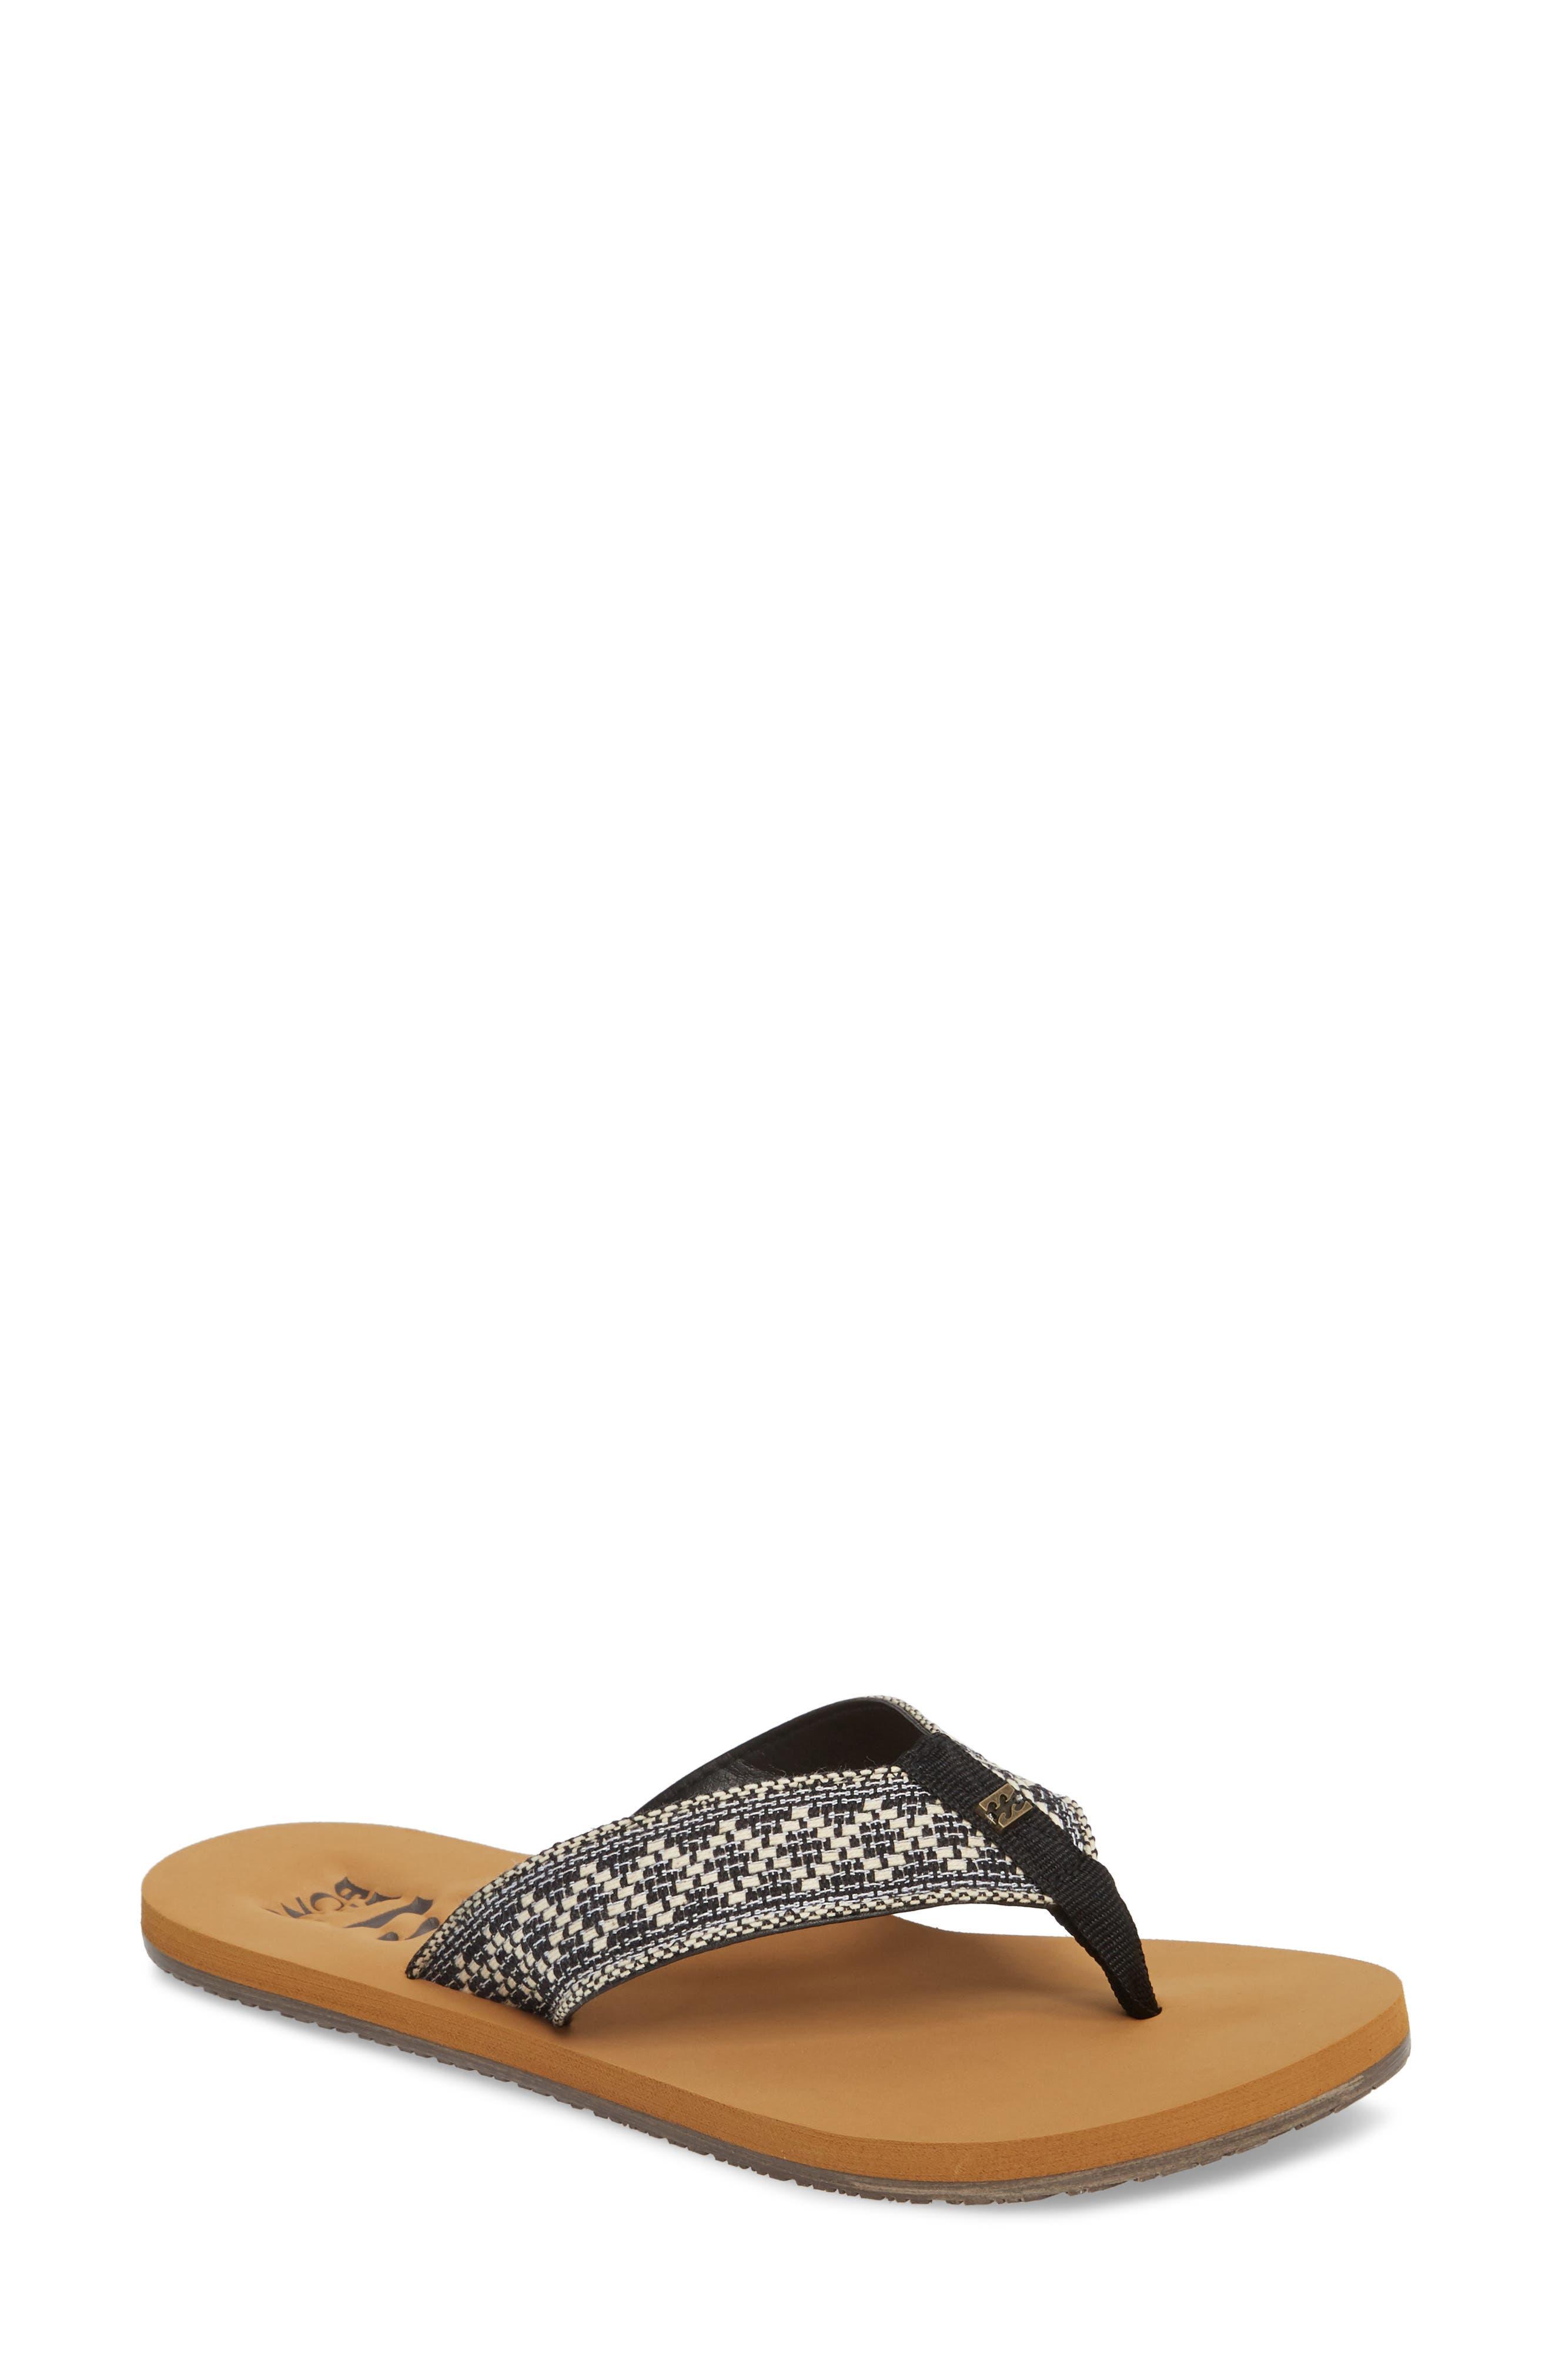 Baja Flip Flop,                         Main,                         color, Cool Grey